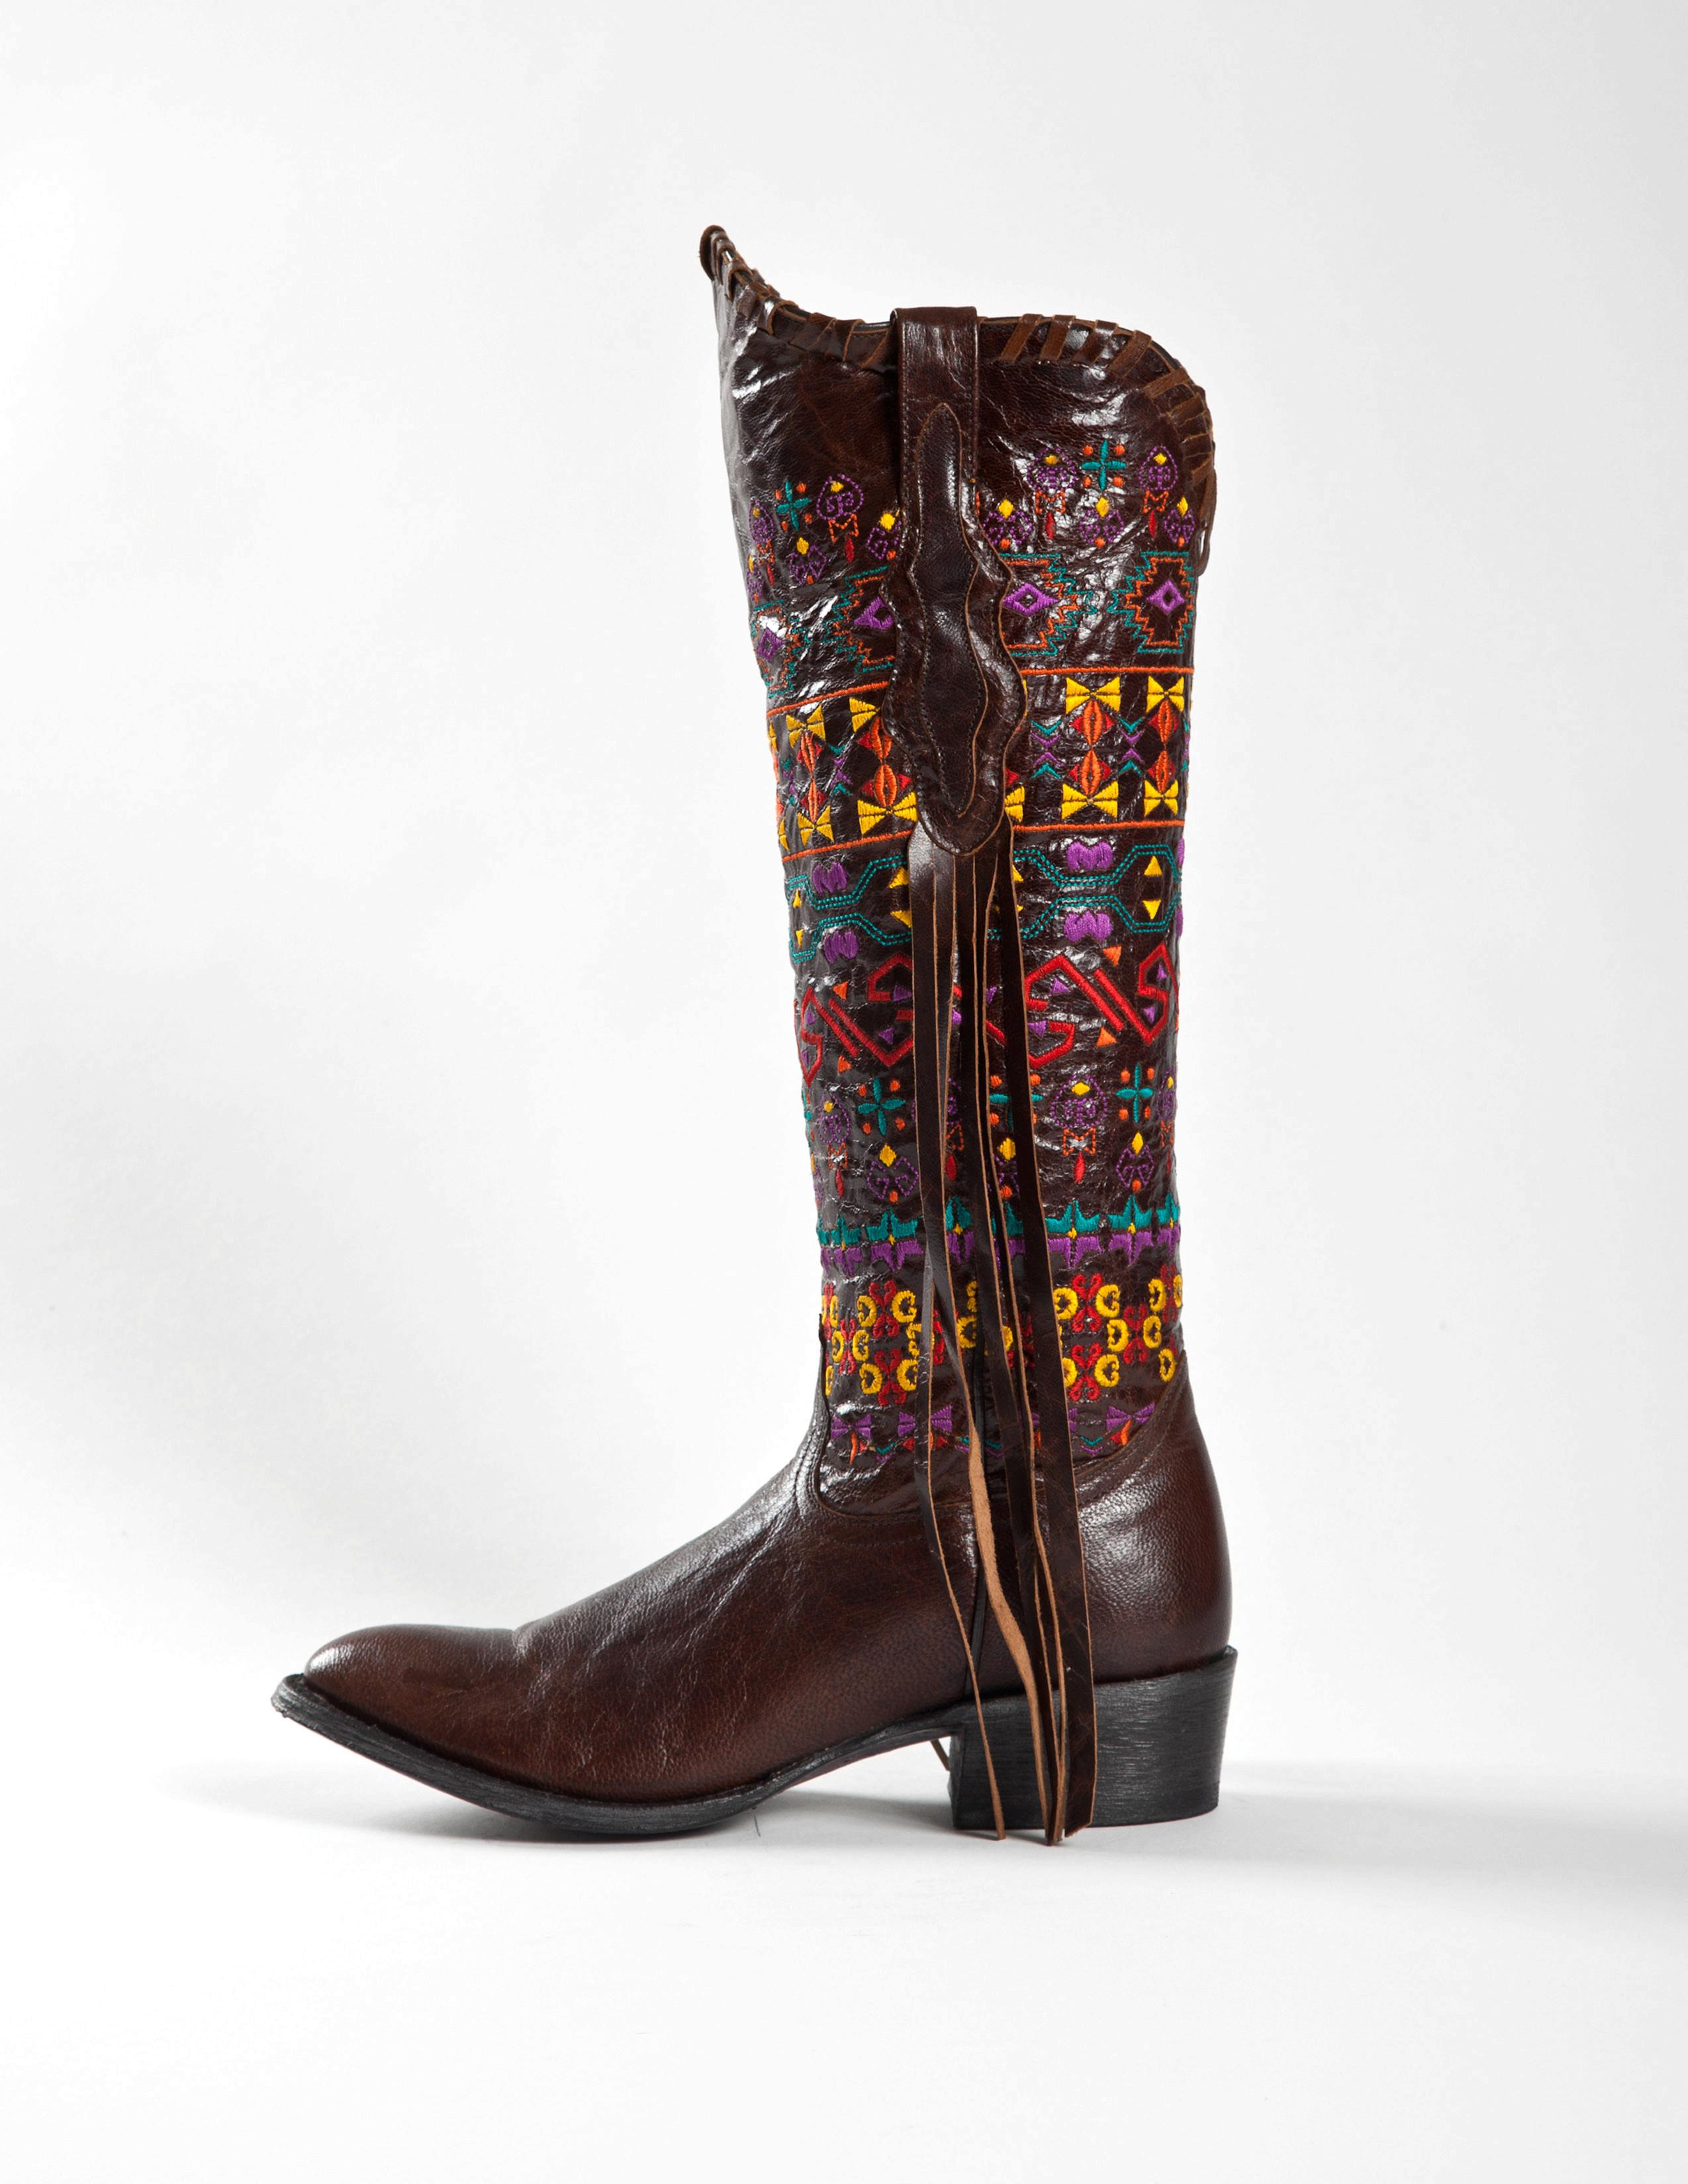 Johnny Ringo Women's Tall Fringe Western Boots JRS806-9B